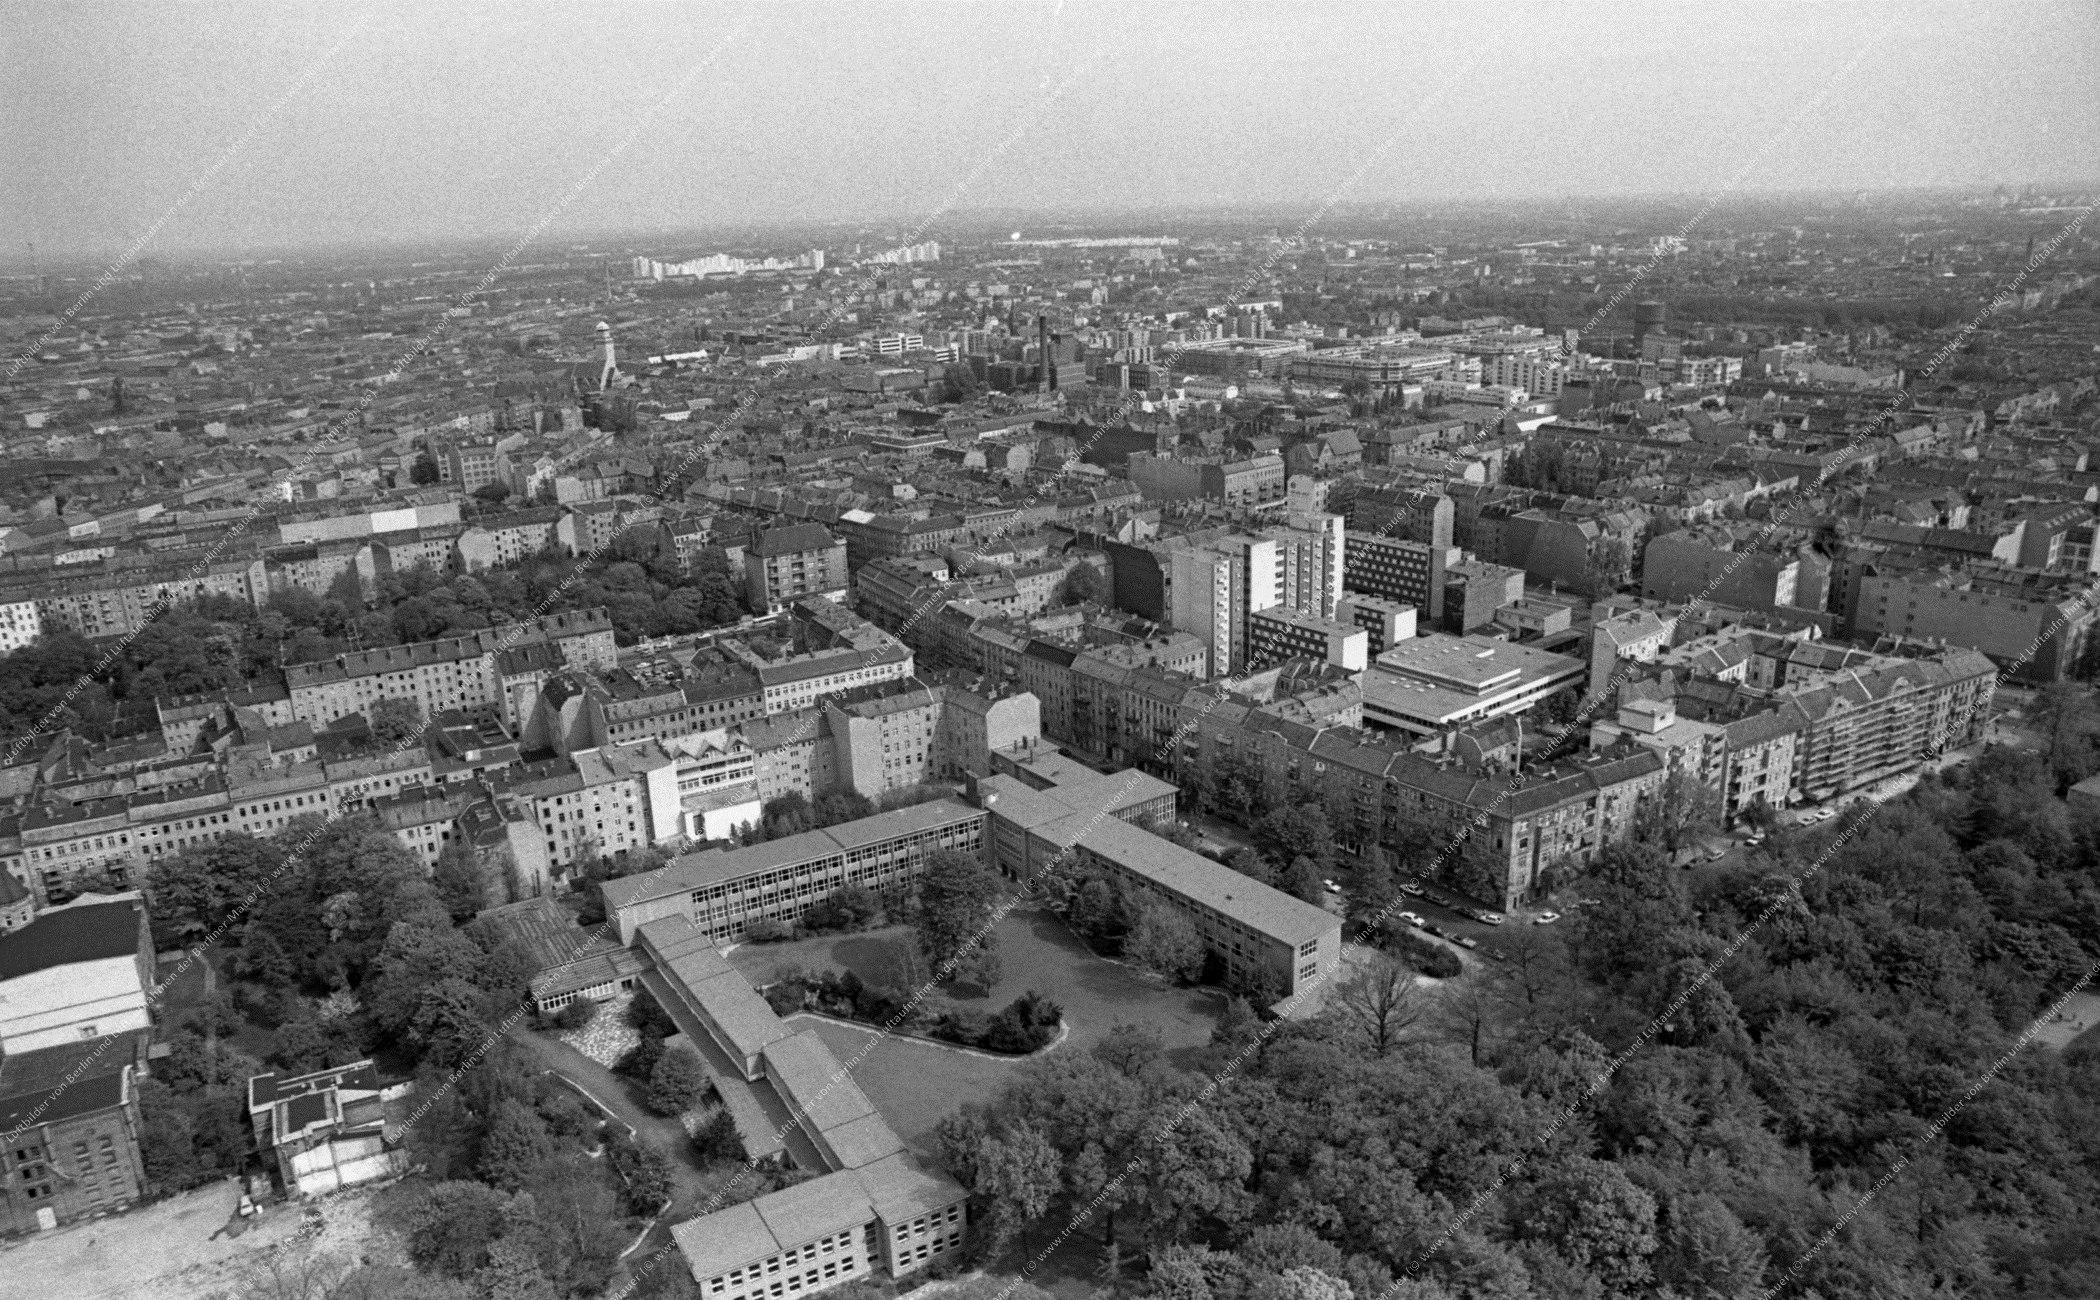 Luftbild der Hasenheide entlang der Karlsgartenstraße quer zur Fontanestraße am 12. Mai 1982 (Bild 102)